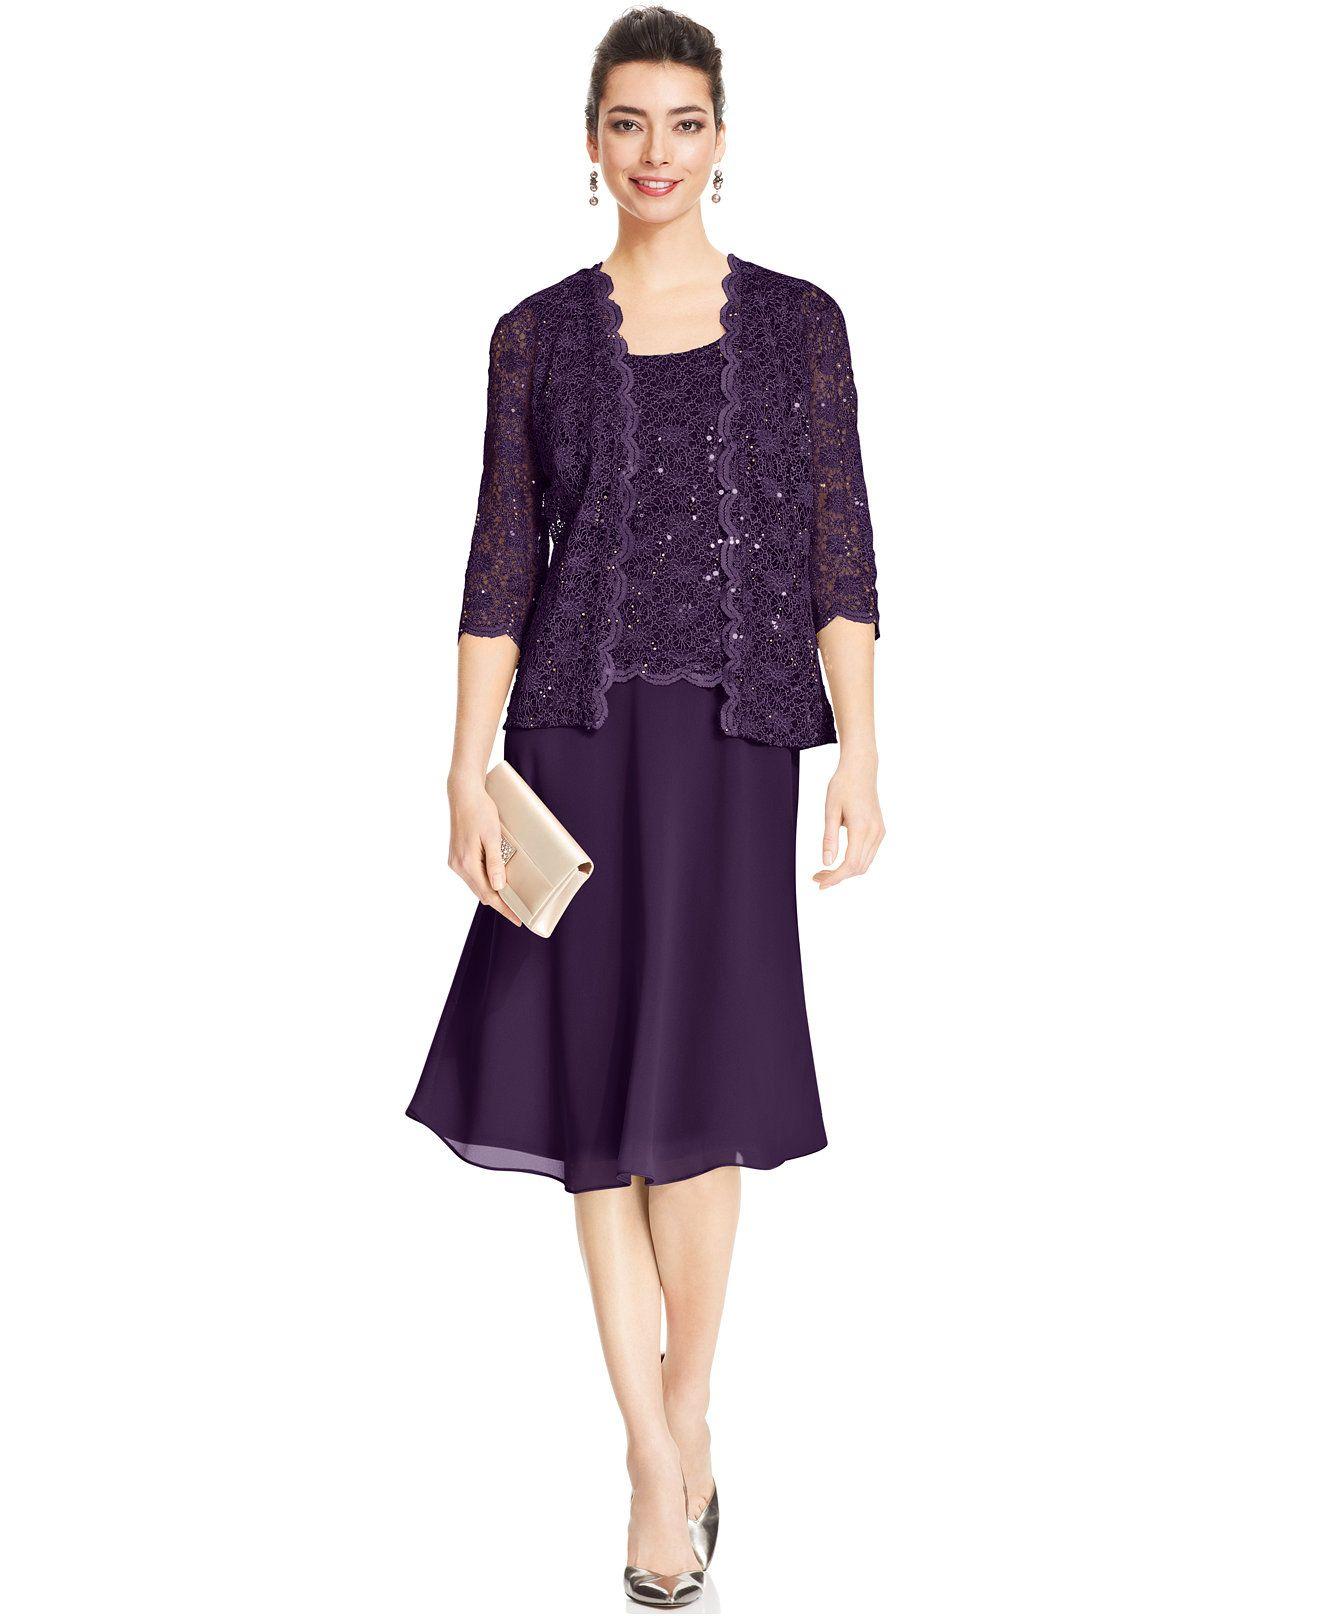 d33cc90a43c R M Richards Petite Sequin Lace Dress and Jacket - Mother of the Bride -  Women - Macy s